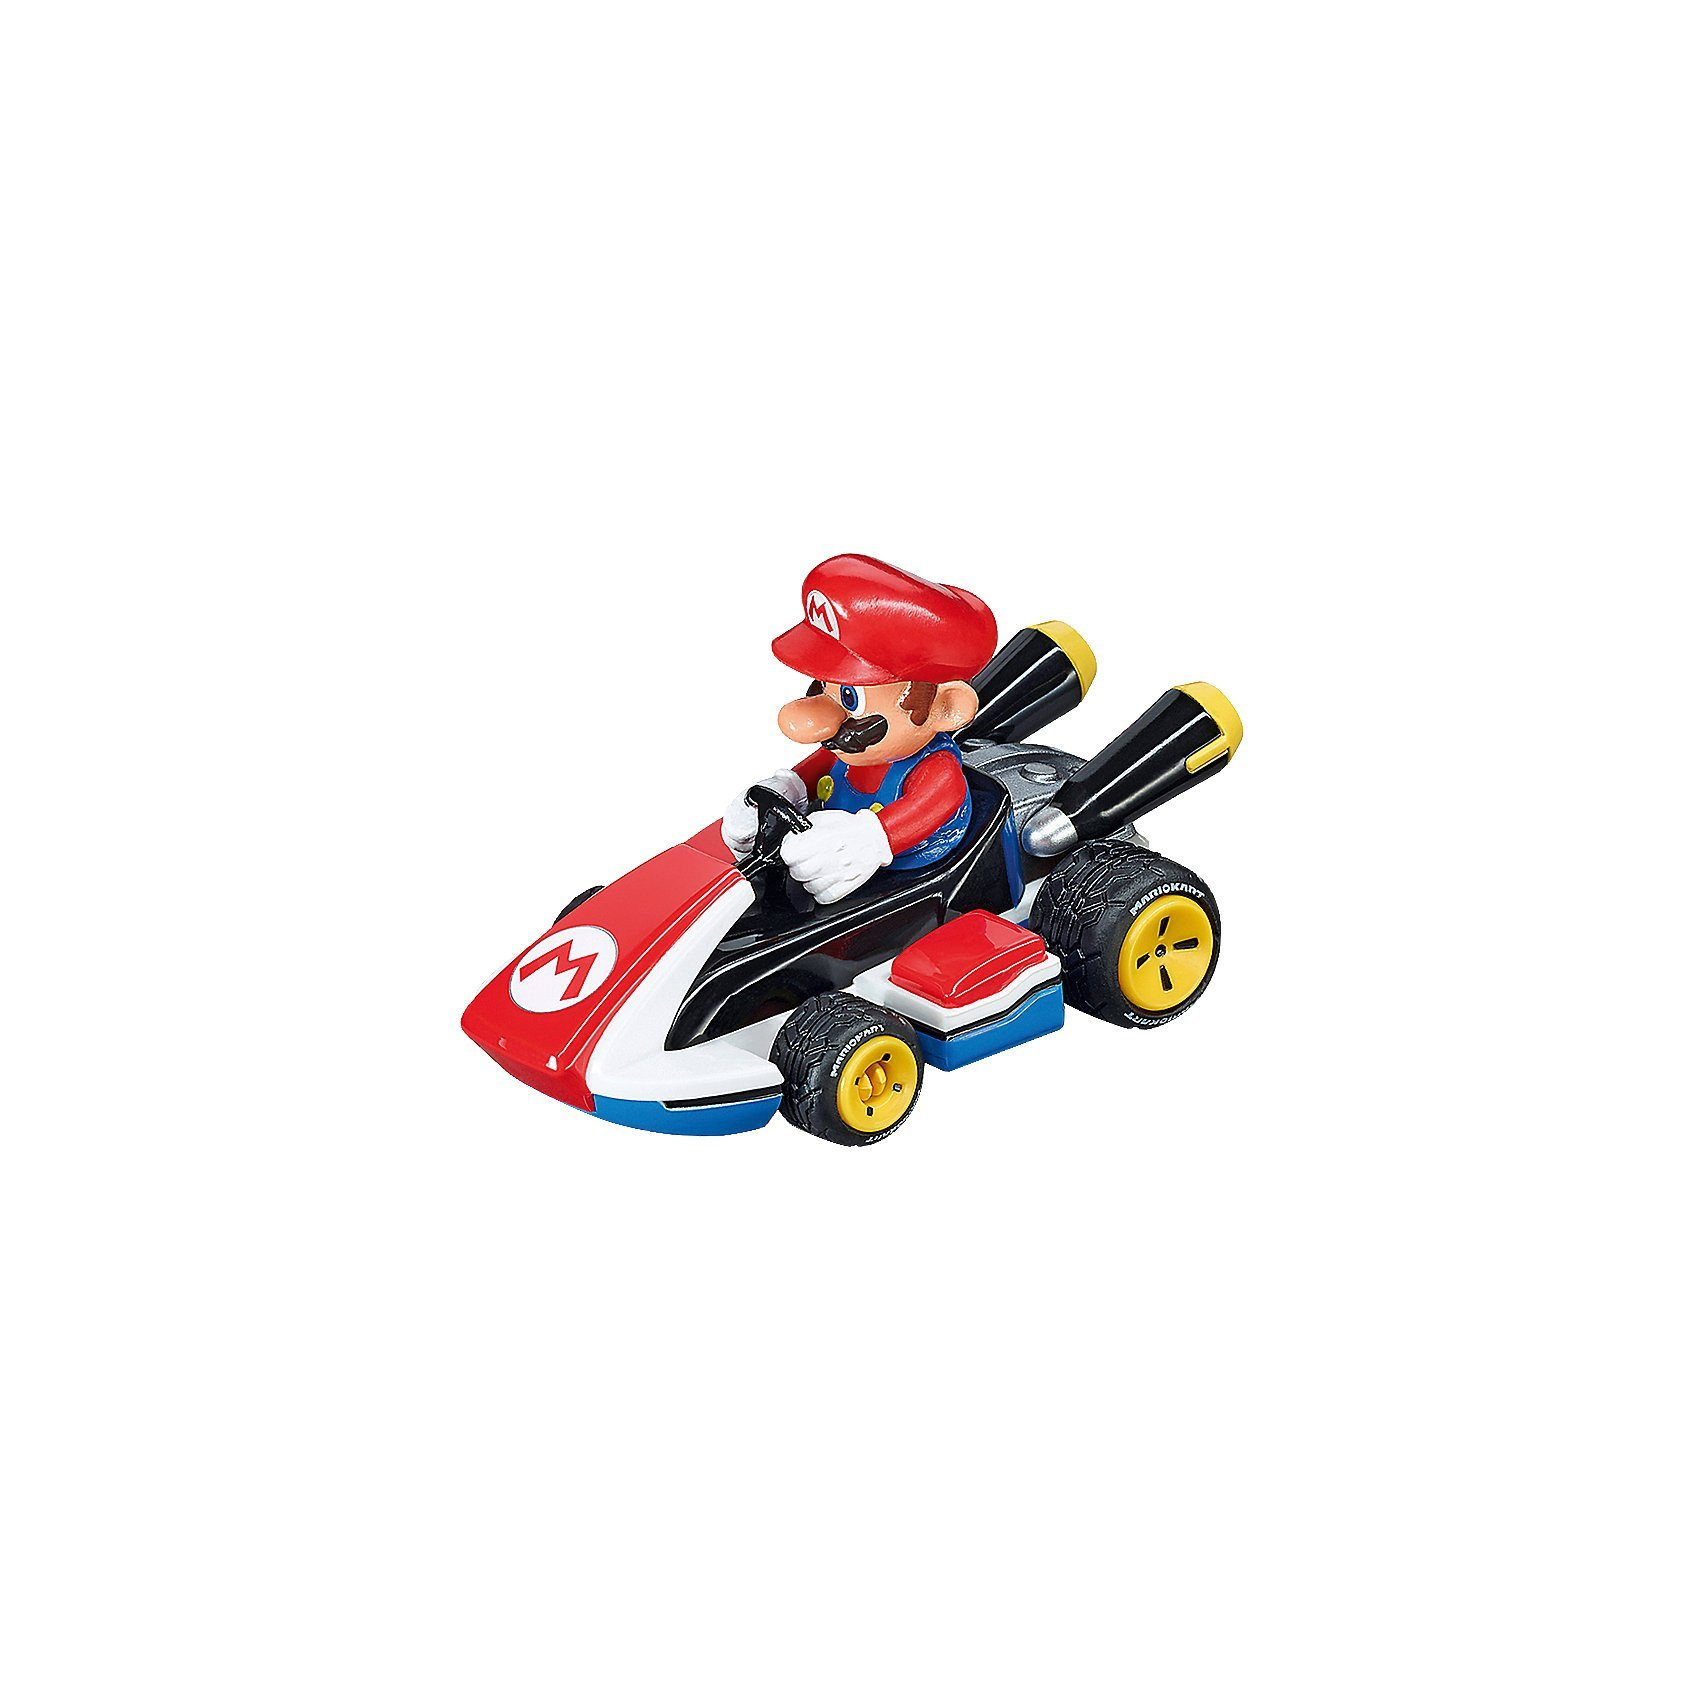 Carrera GO!!! 64033 Nintendo Mario Kart™ 8 - Mario